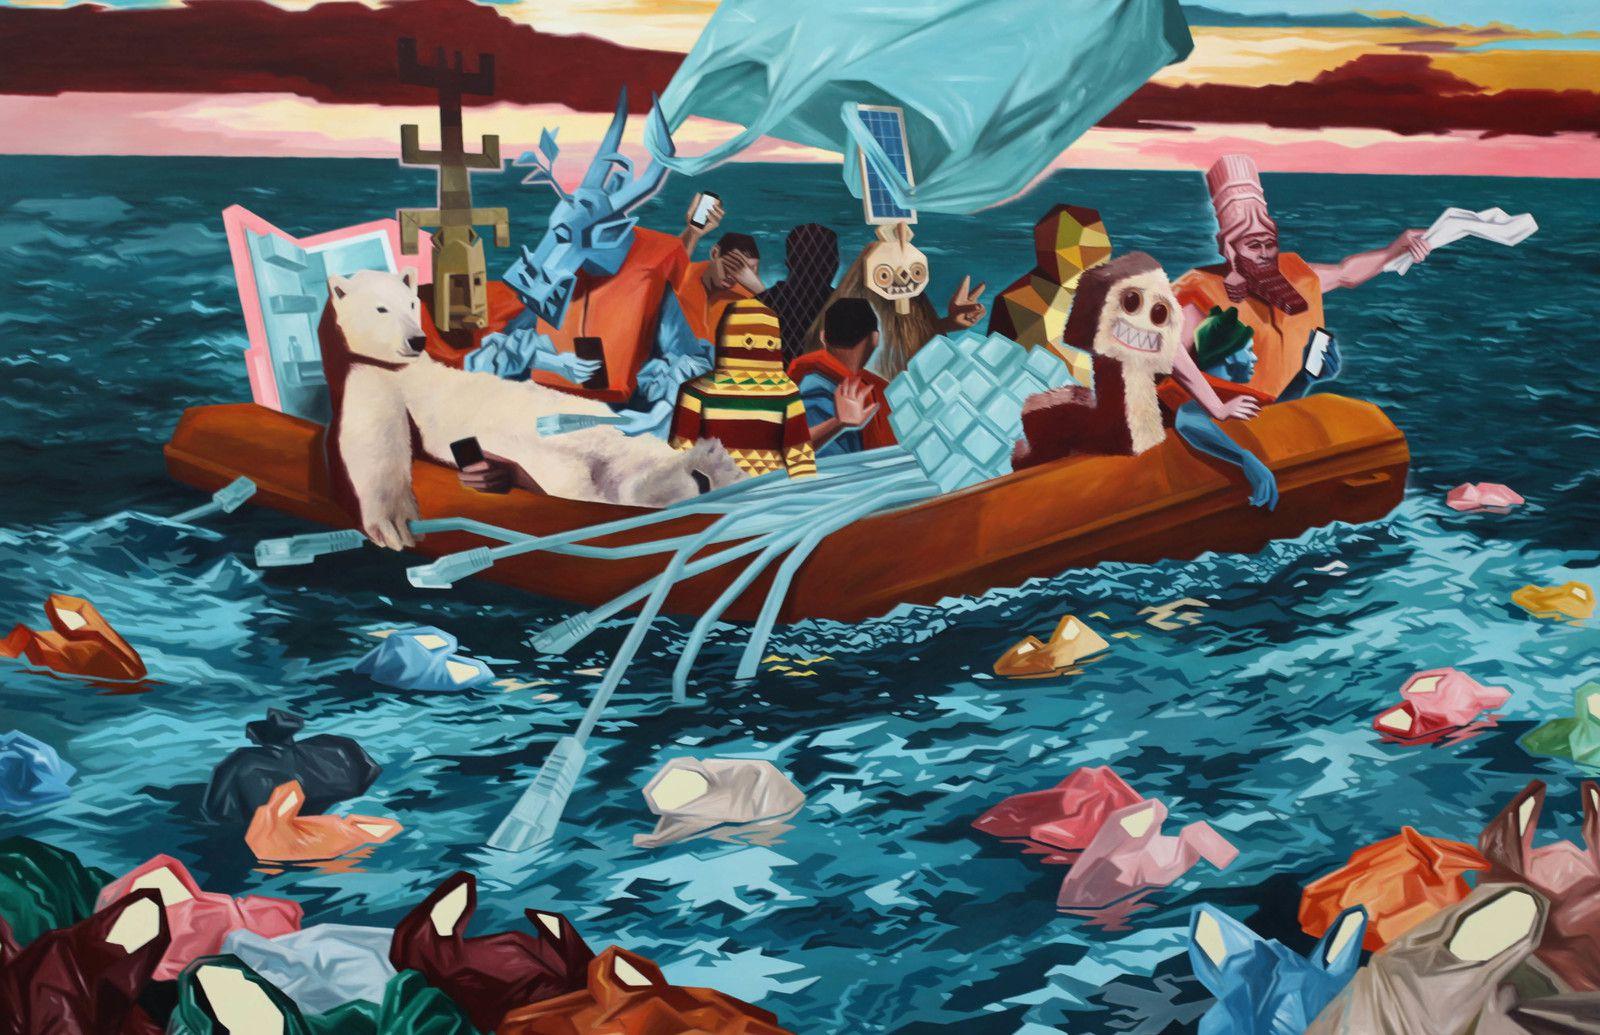 """Plastik"", 2020 de KRIKI - Courtesy de l'artiste et de la galerie Galerie Suzanne TARASIEVE  Photo Éric Simon"